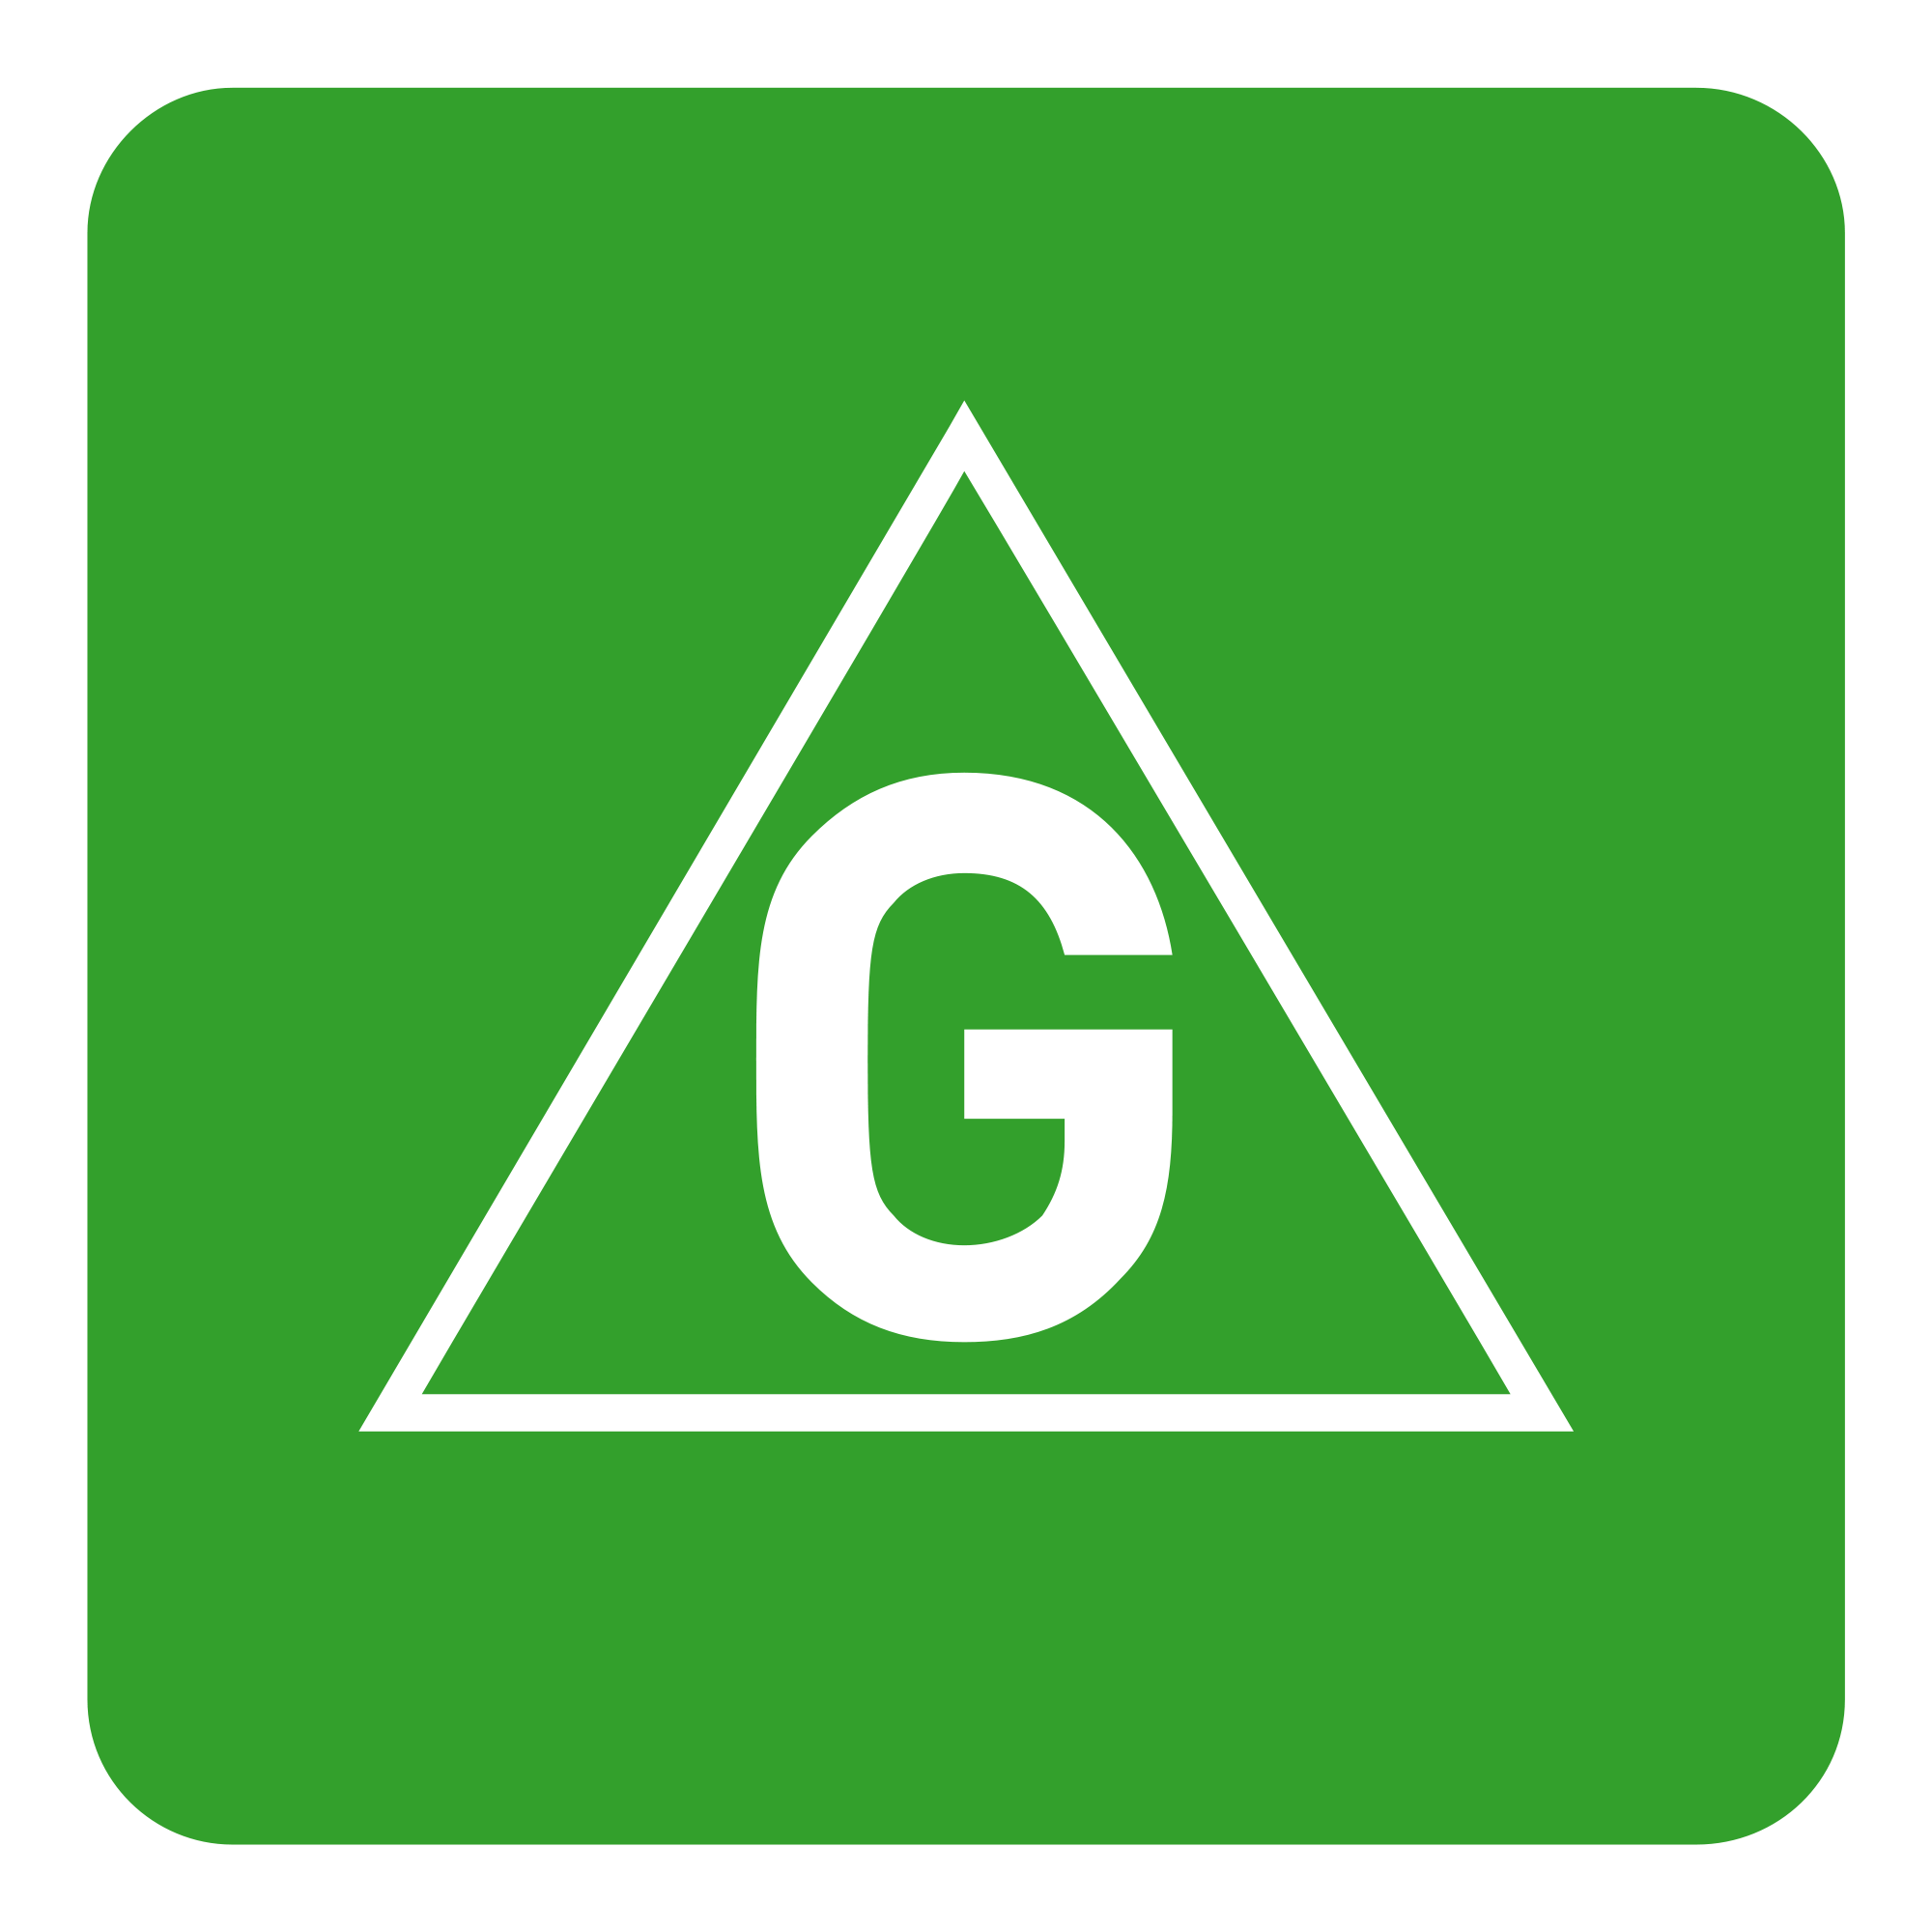 rated g logos rh logolynx com  rated g logopedia